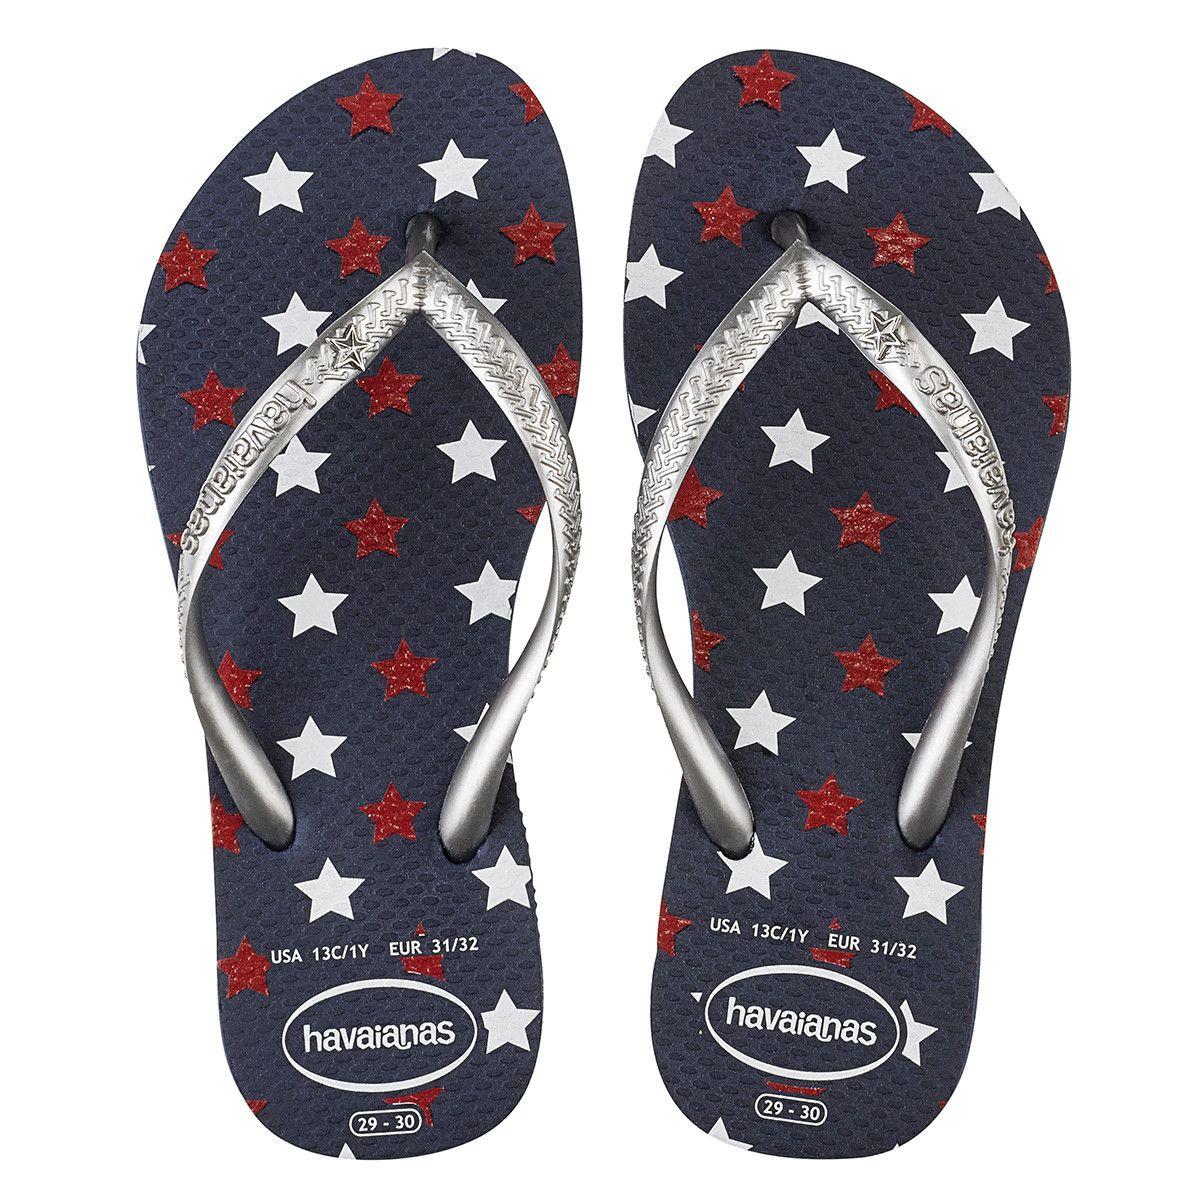 a9cd1399a5f Havaianas Kids Slim Stars Glitter Sandal Navy Blue Price From  18